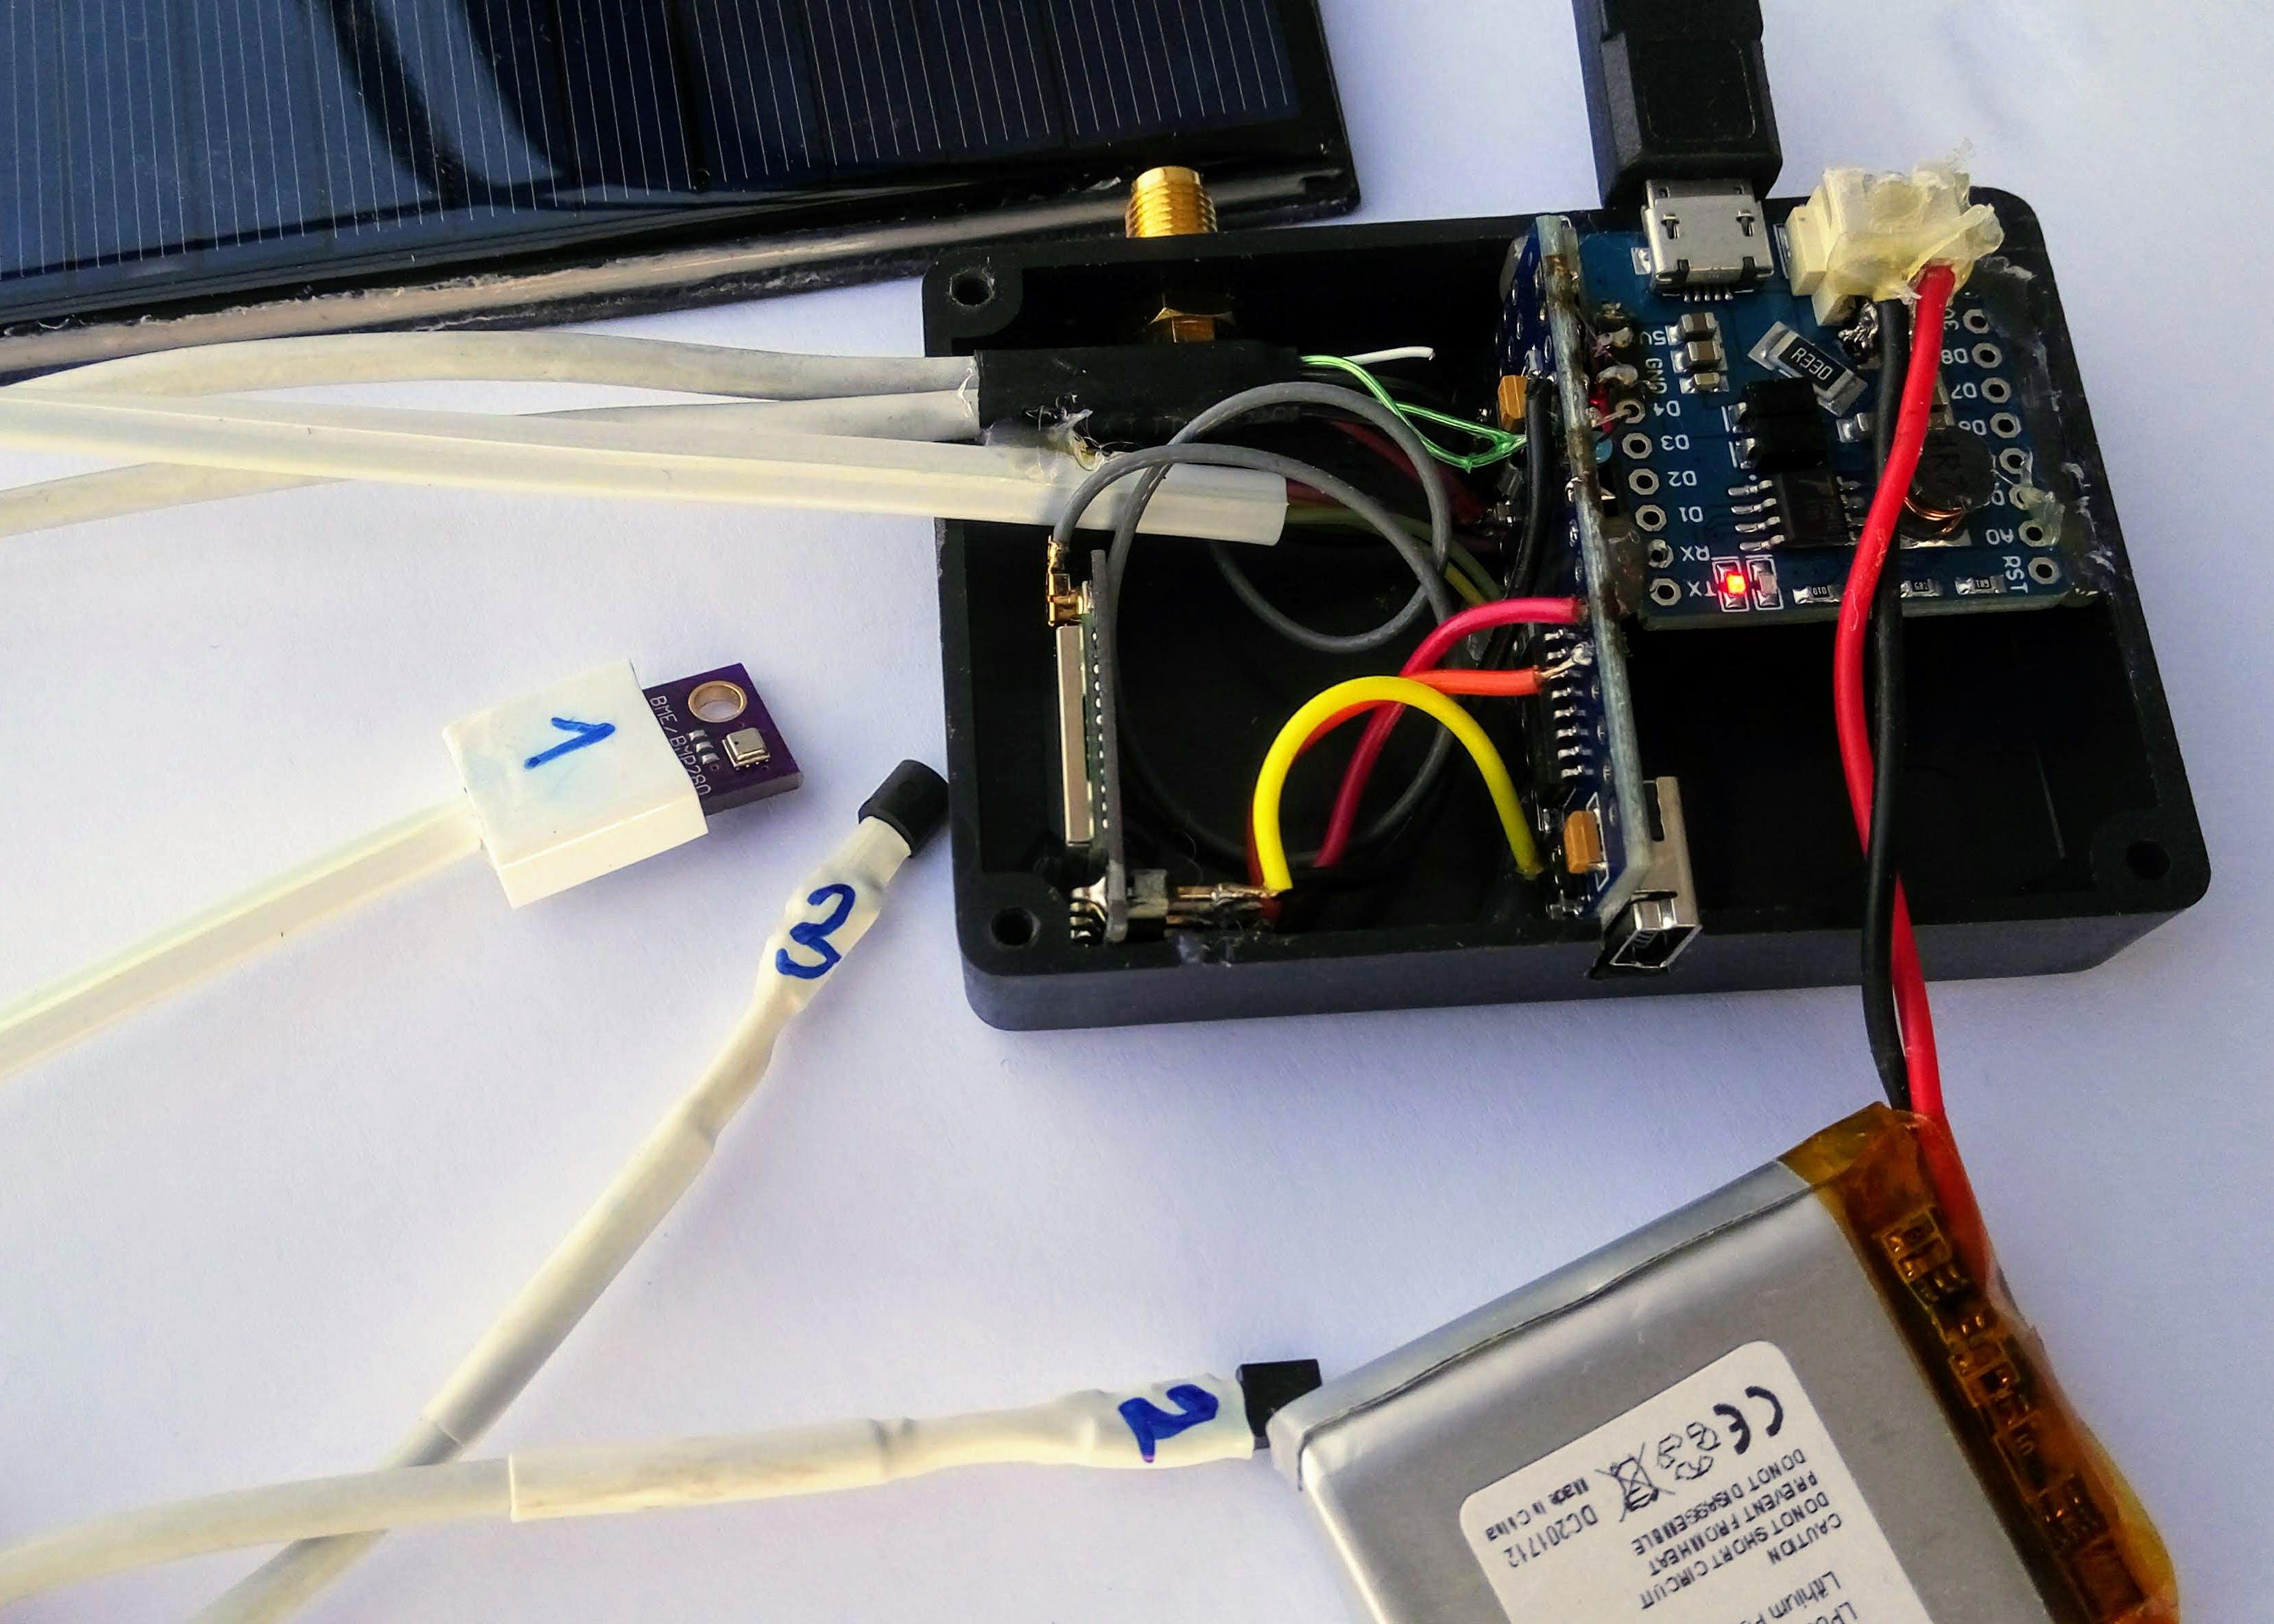 iTRUBEC Sigfox beehive monitor